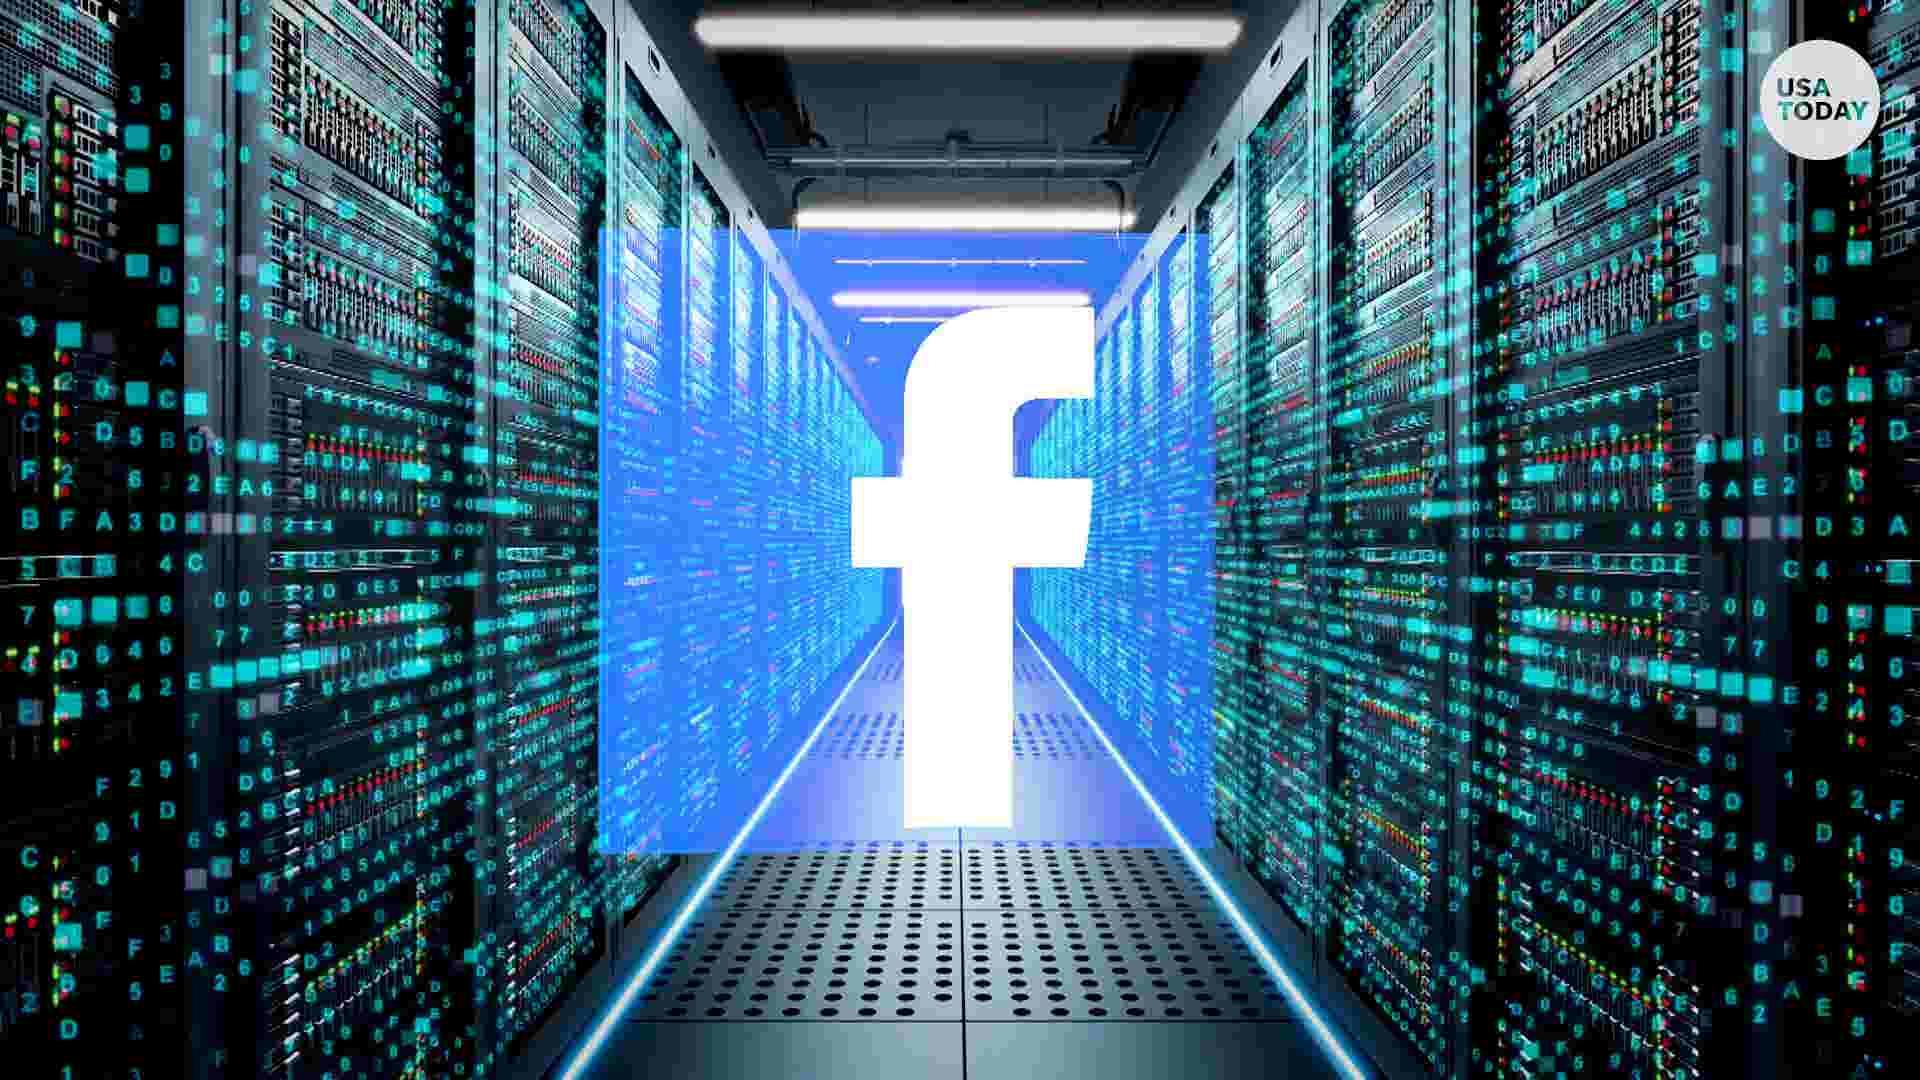 Facebook in 2019: 10 reasons to dump the social media platform